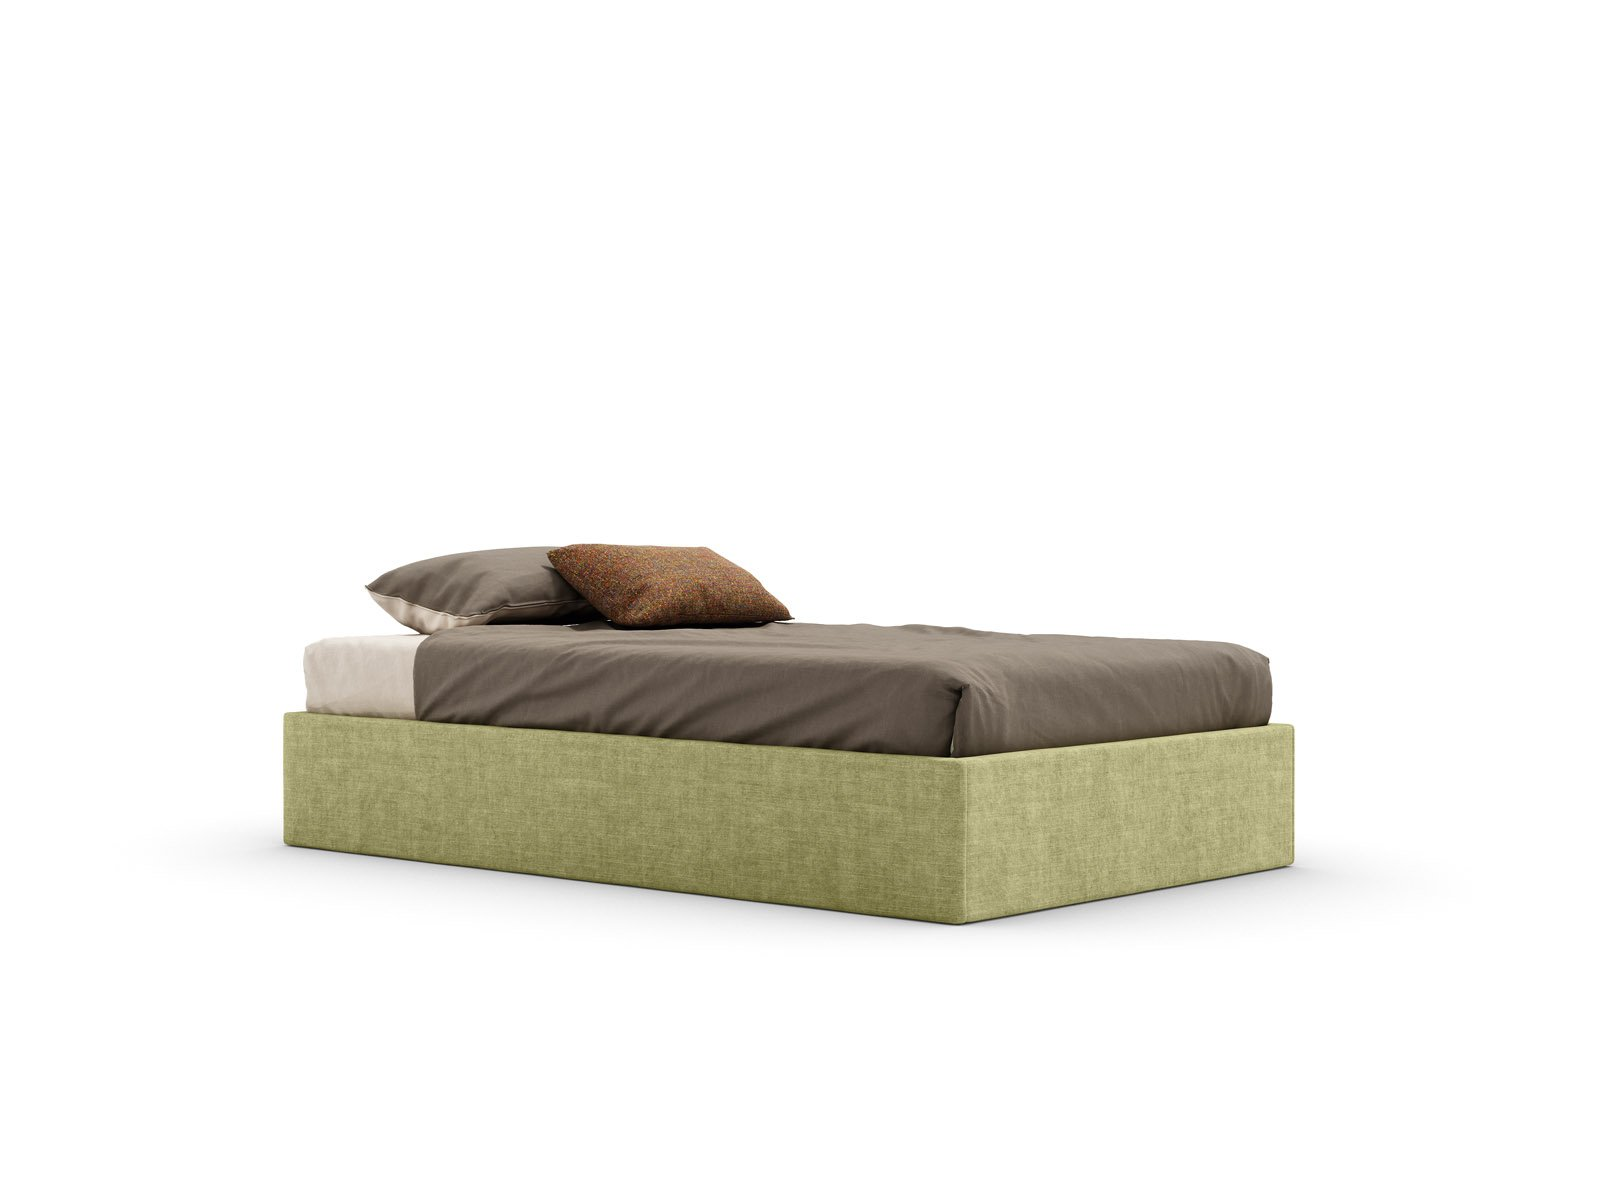 Skim divan bed